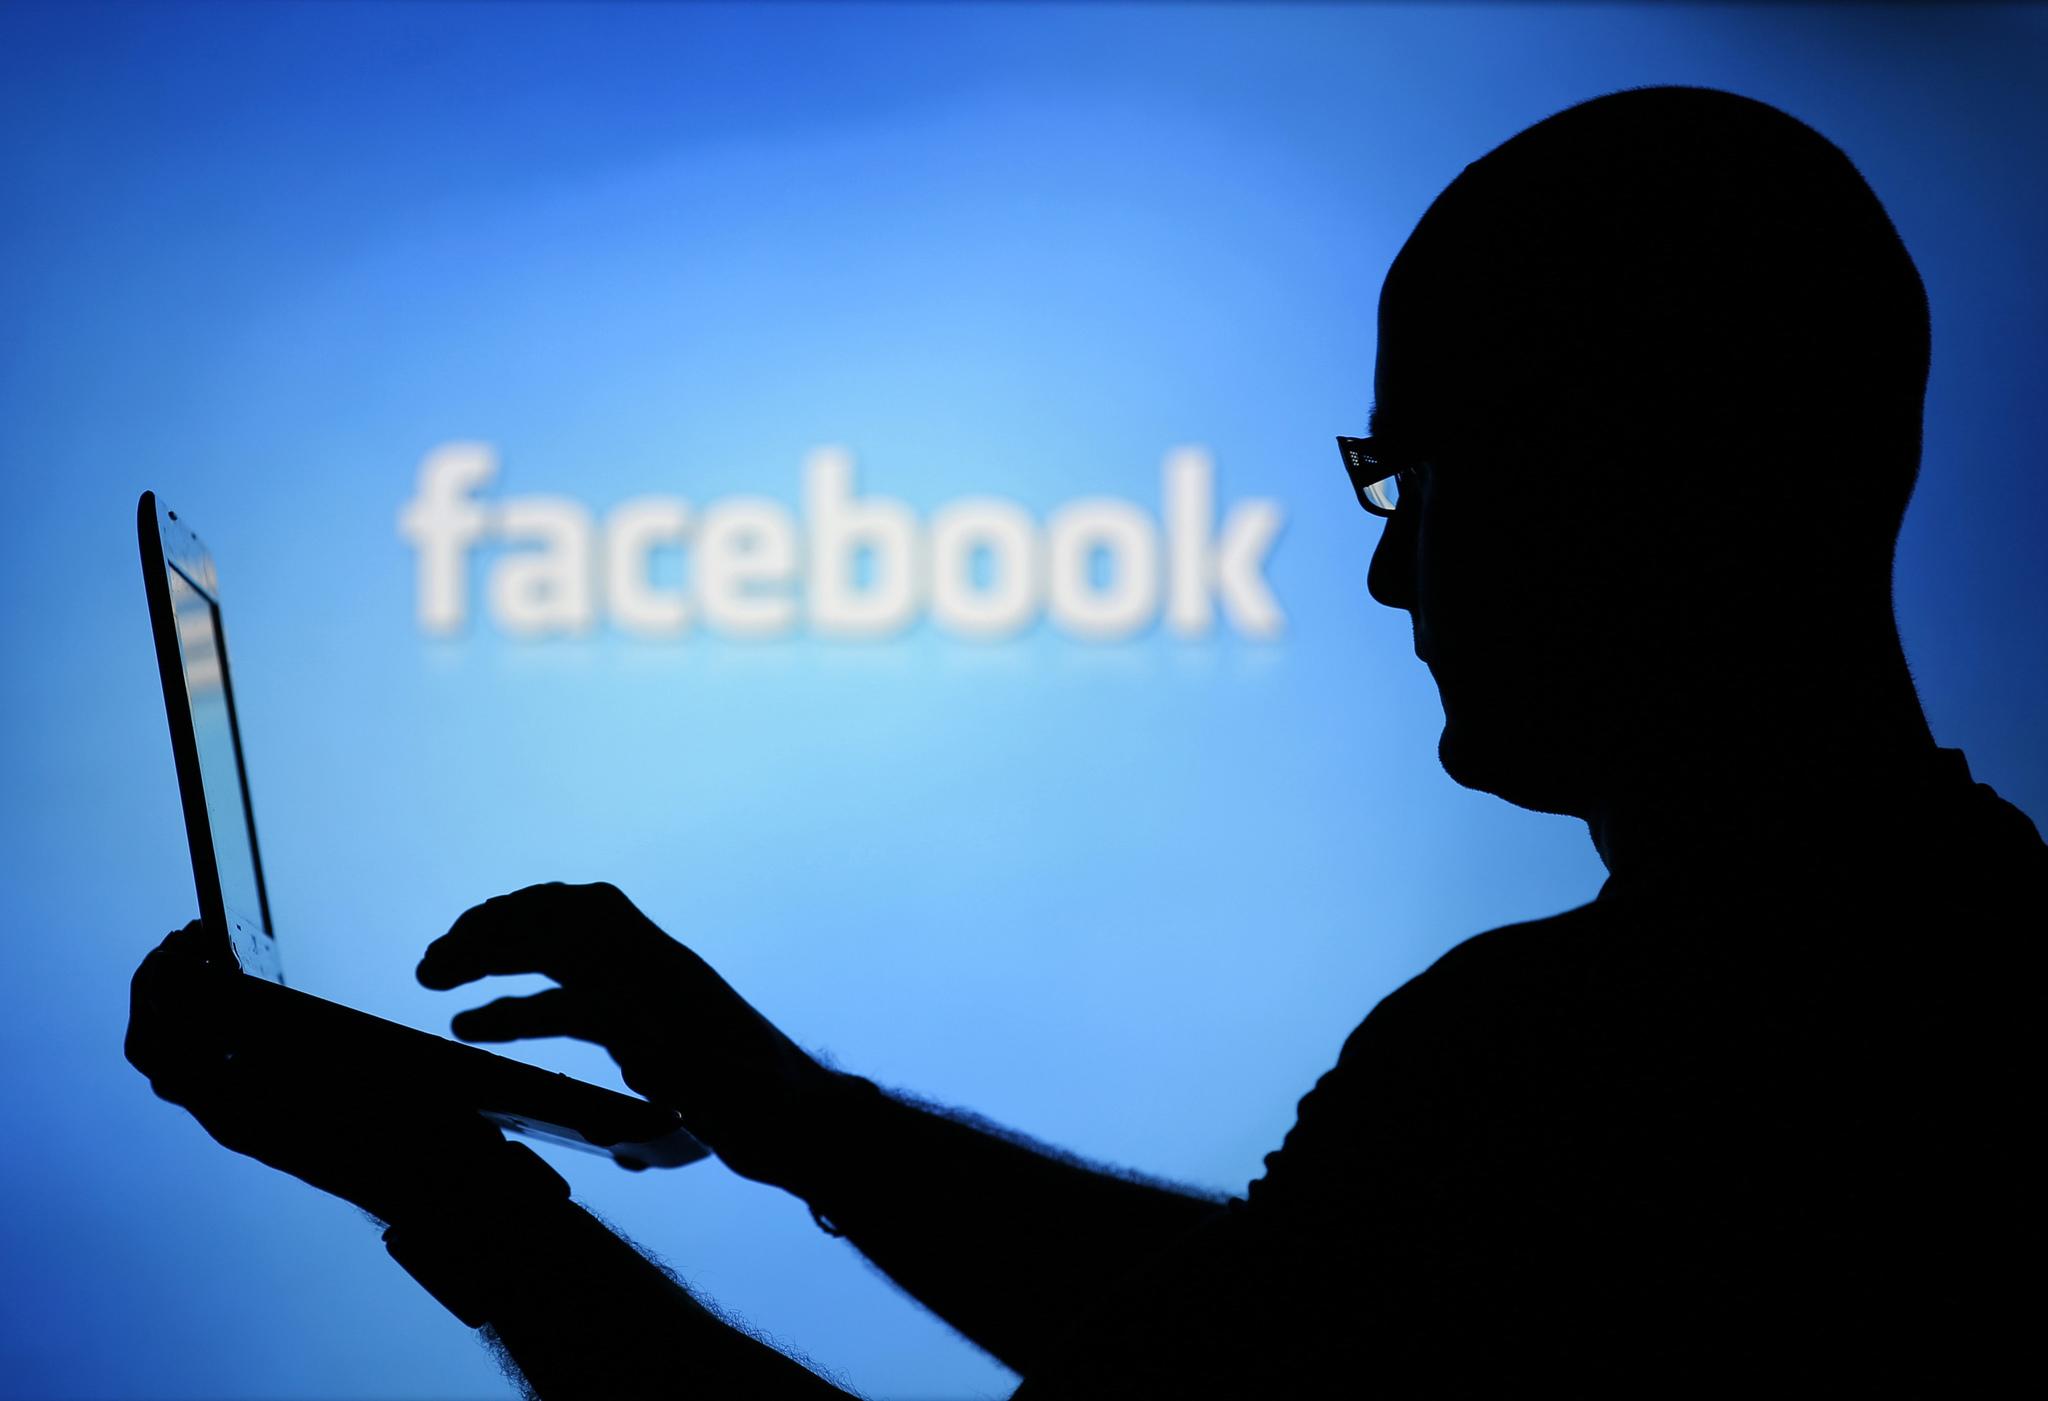 Facebook Desktop Wallpaper